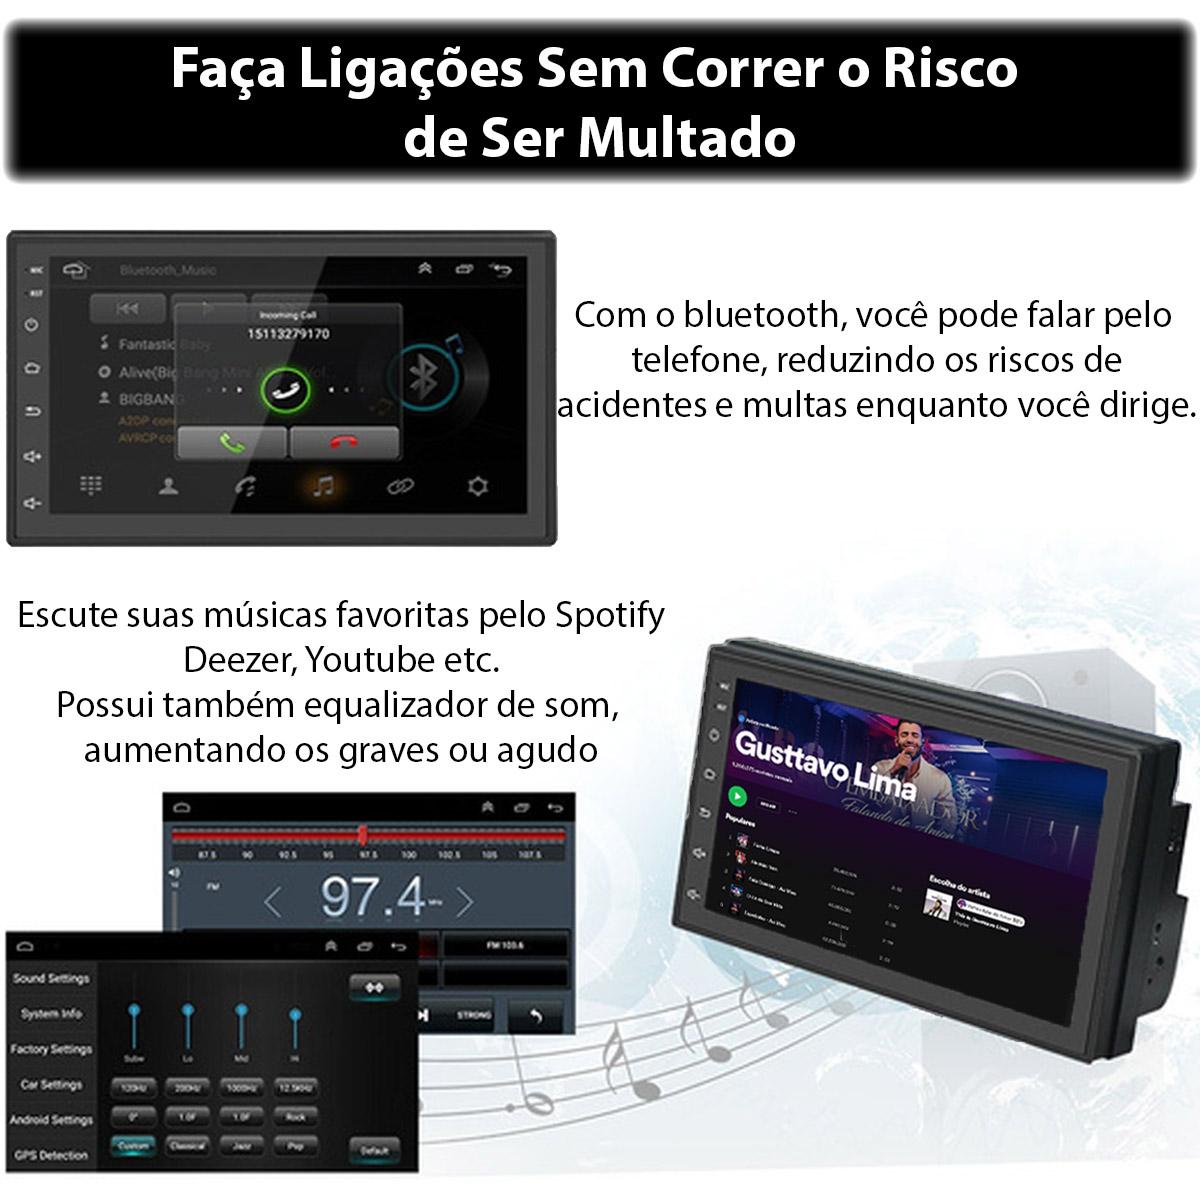 Kit Central Multimídia Android Muzik Bluetooth Mp5 9 Polegadas +Alto Falante Pioneer 6 Polegadas Triaxial Poliparts